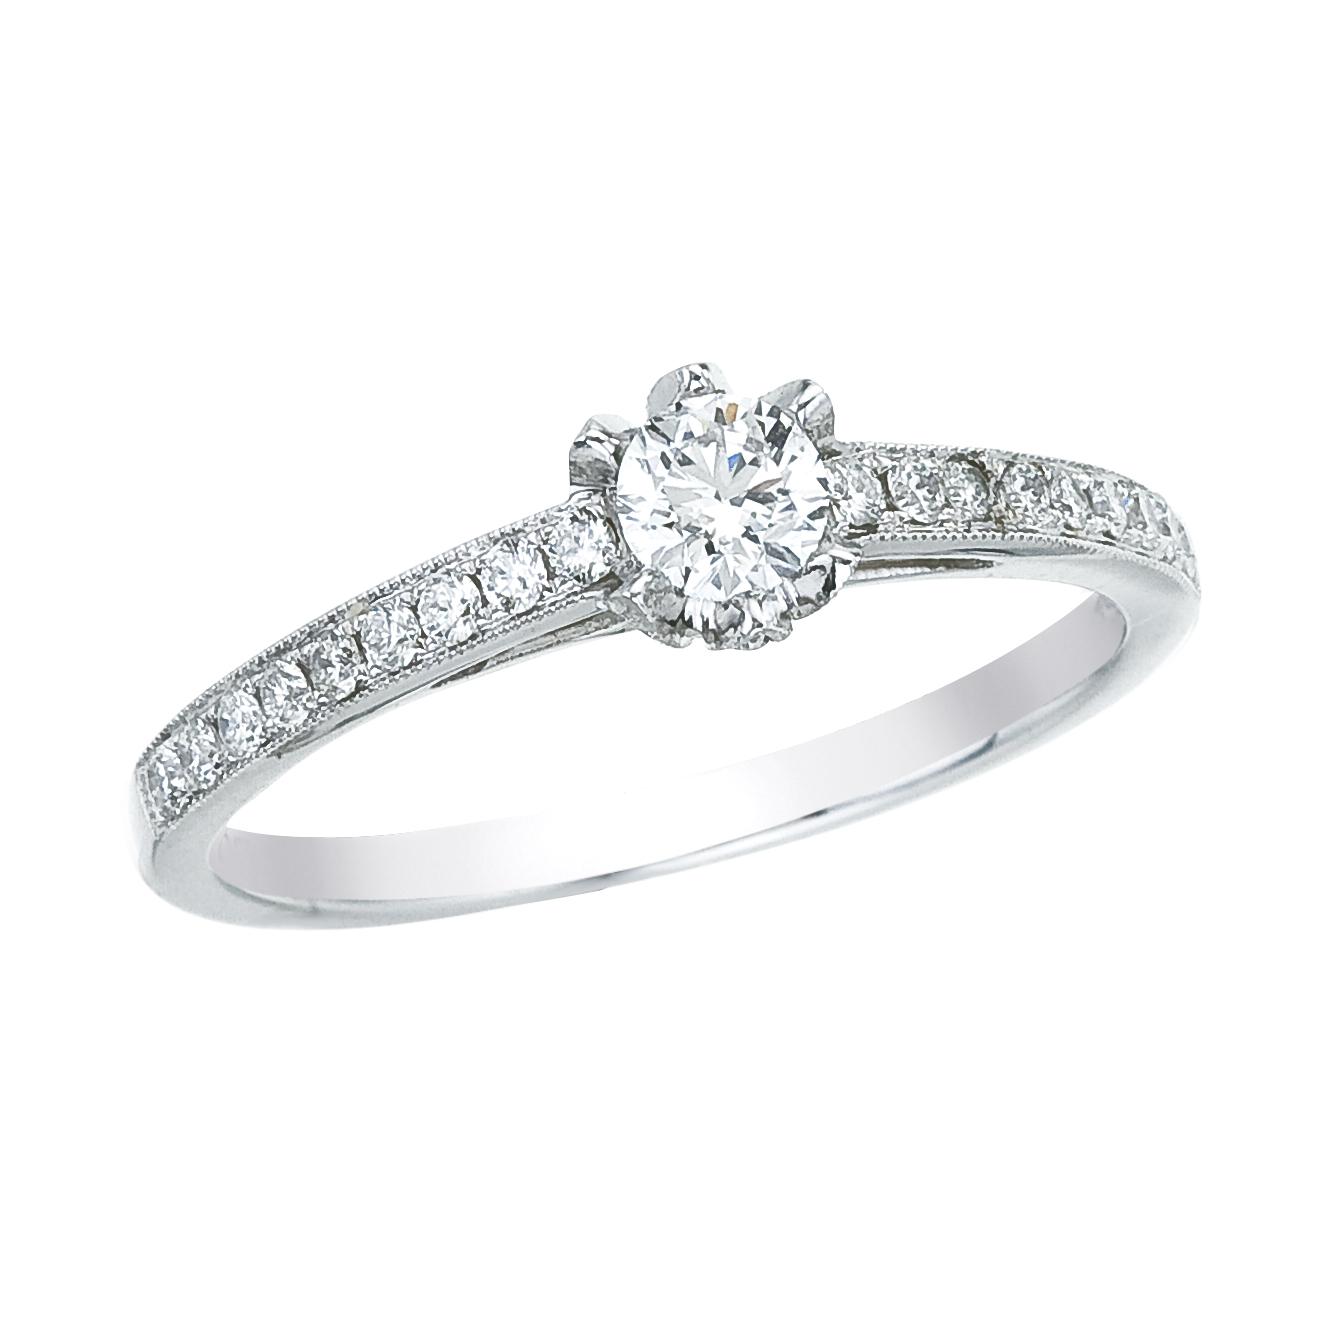 14k White gold Classic Diamond QPID Engagement Ring (0.20 tcw)